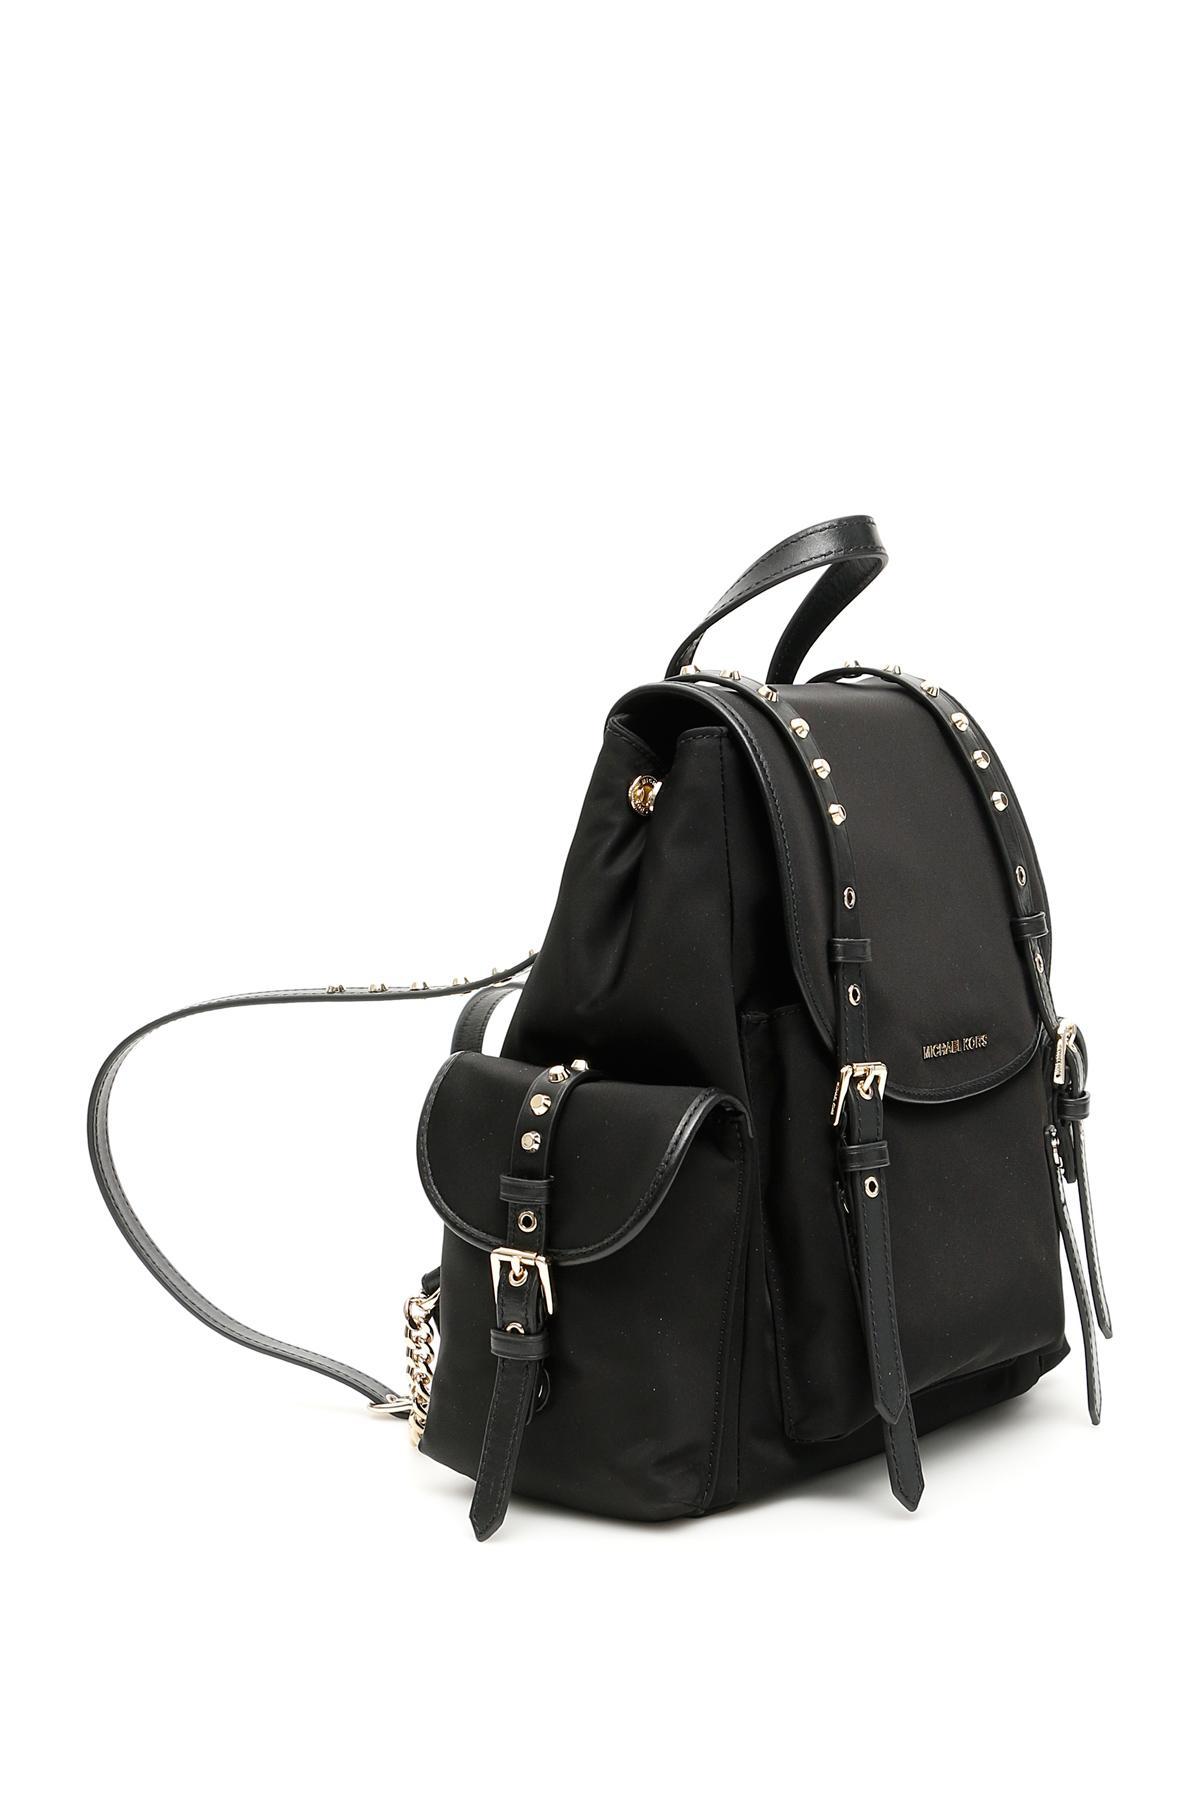 d2aad0441cb1 MICHAEL Michael Kors Leila Backpack in Black - Lyst